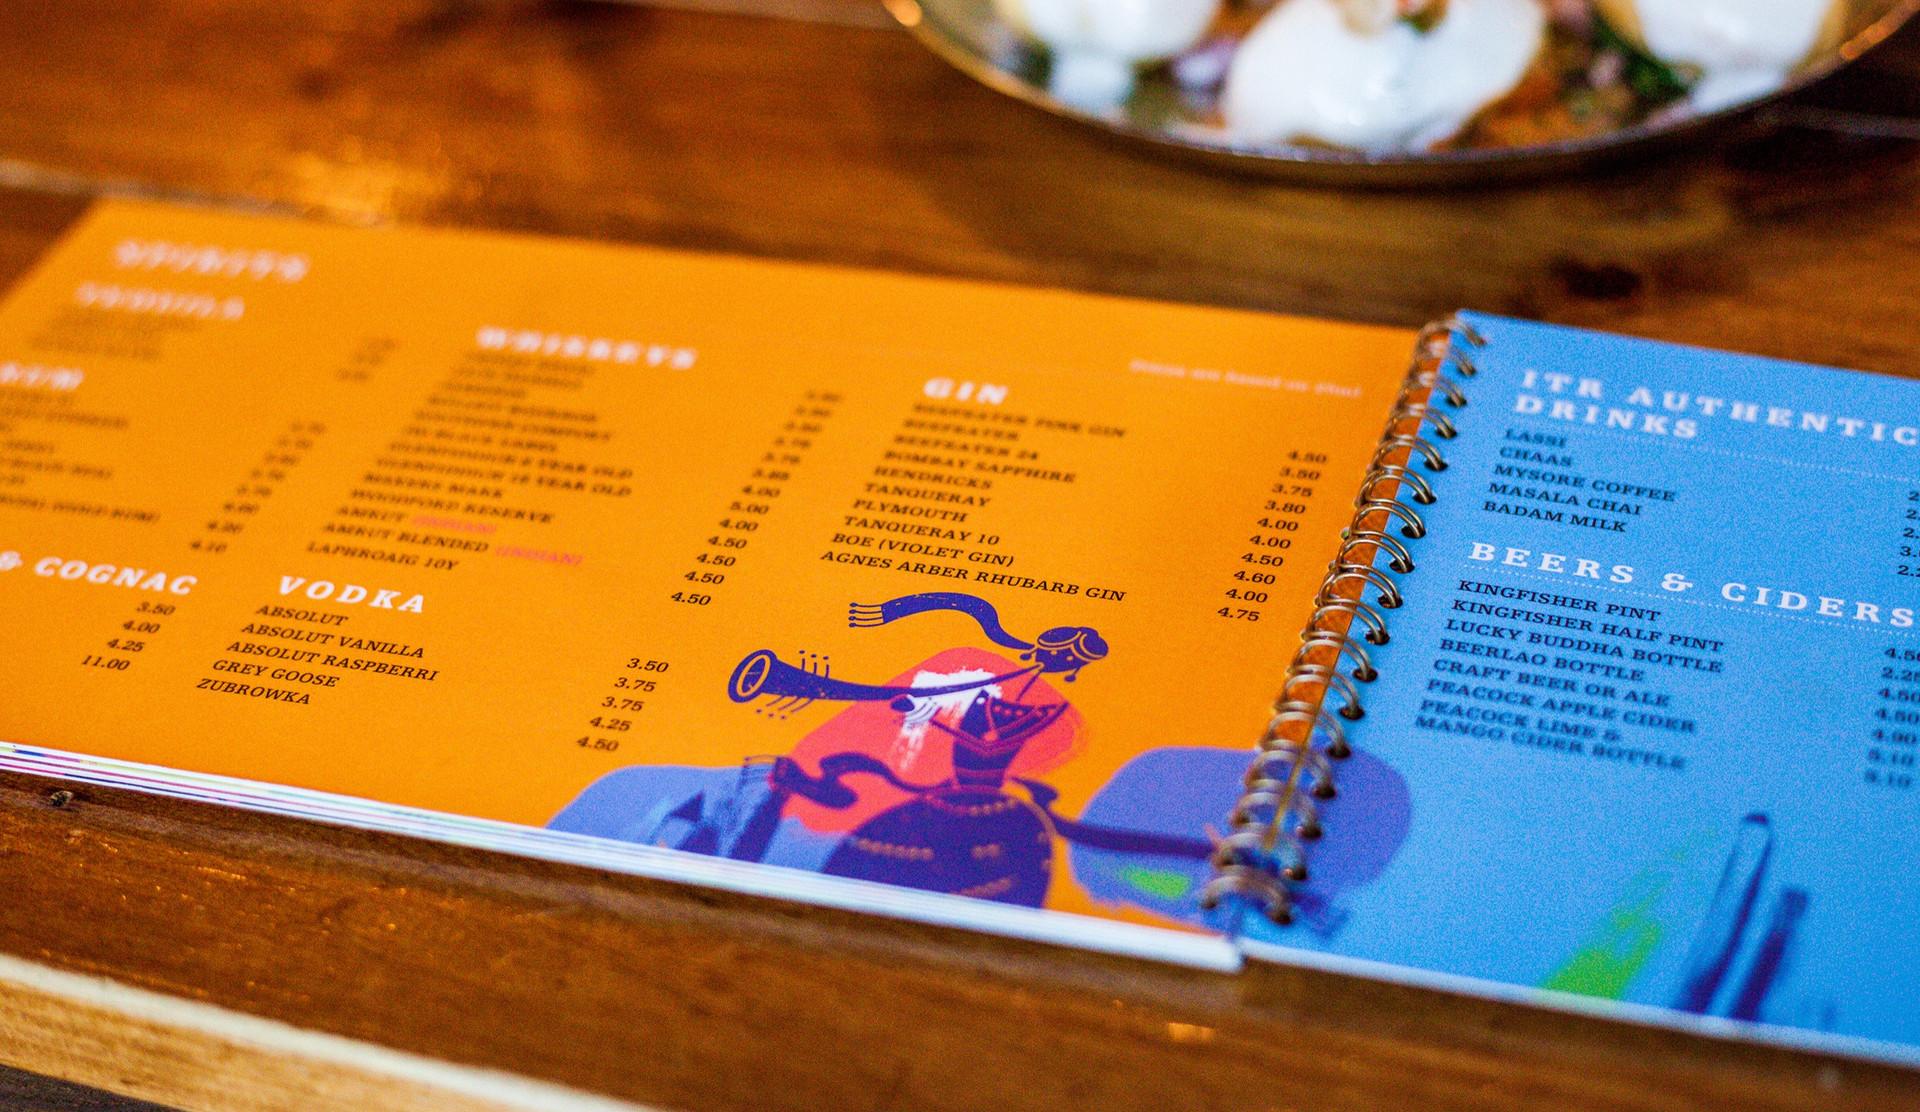 itr drinks menu 5_edited.jpg